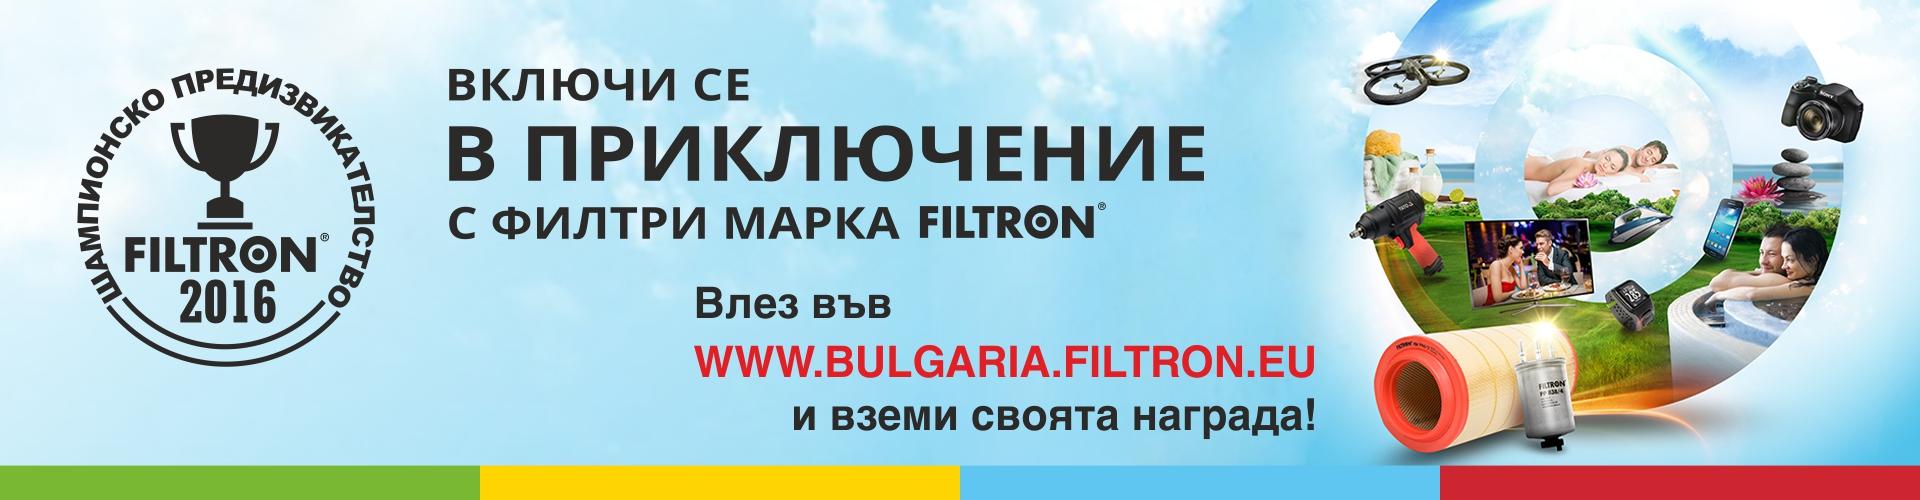 filtron_fevruari2016.jpg